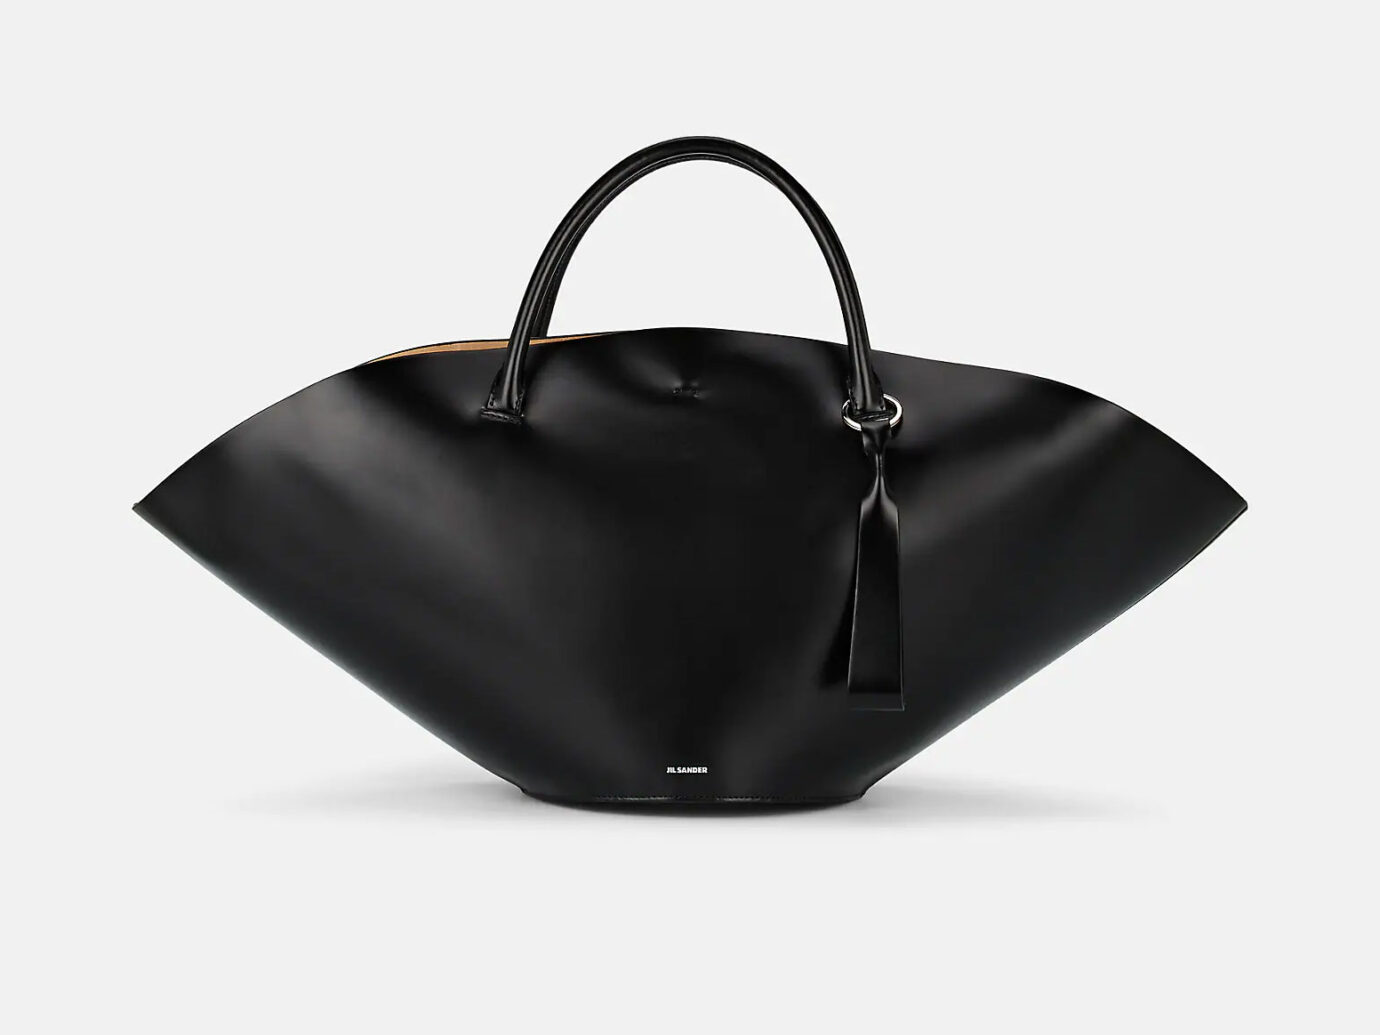 Jil Sander Sombrero Medium Leather Tote Bag